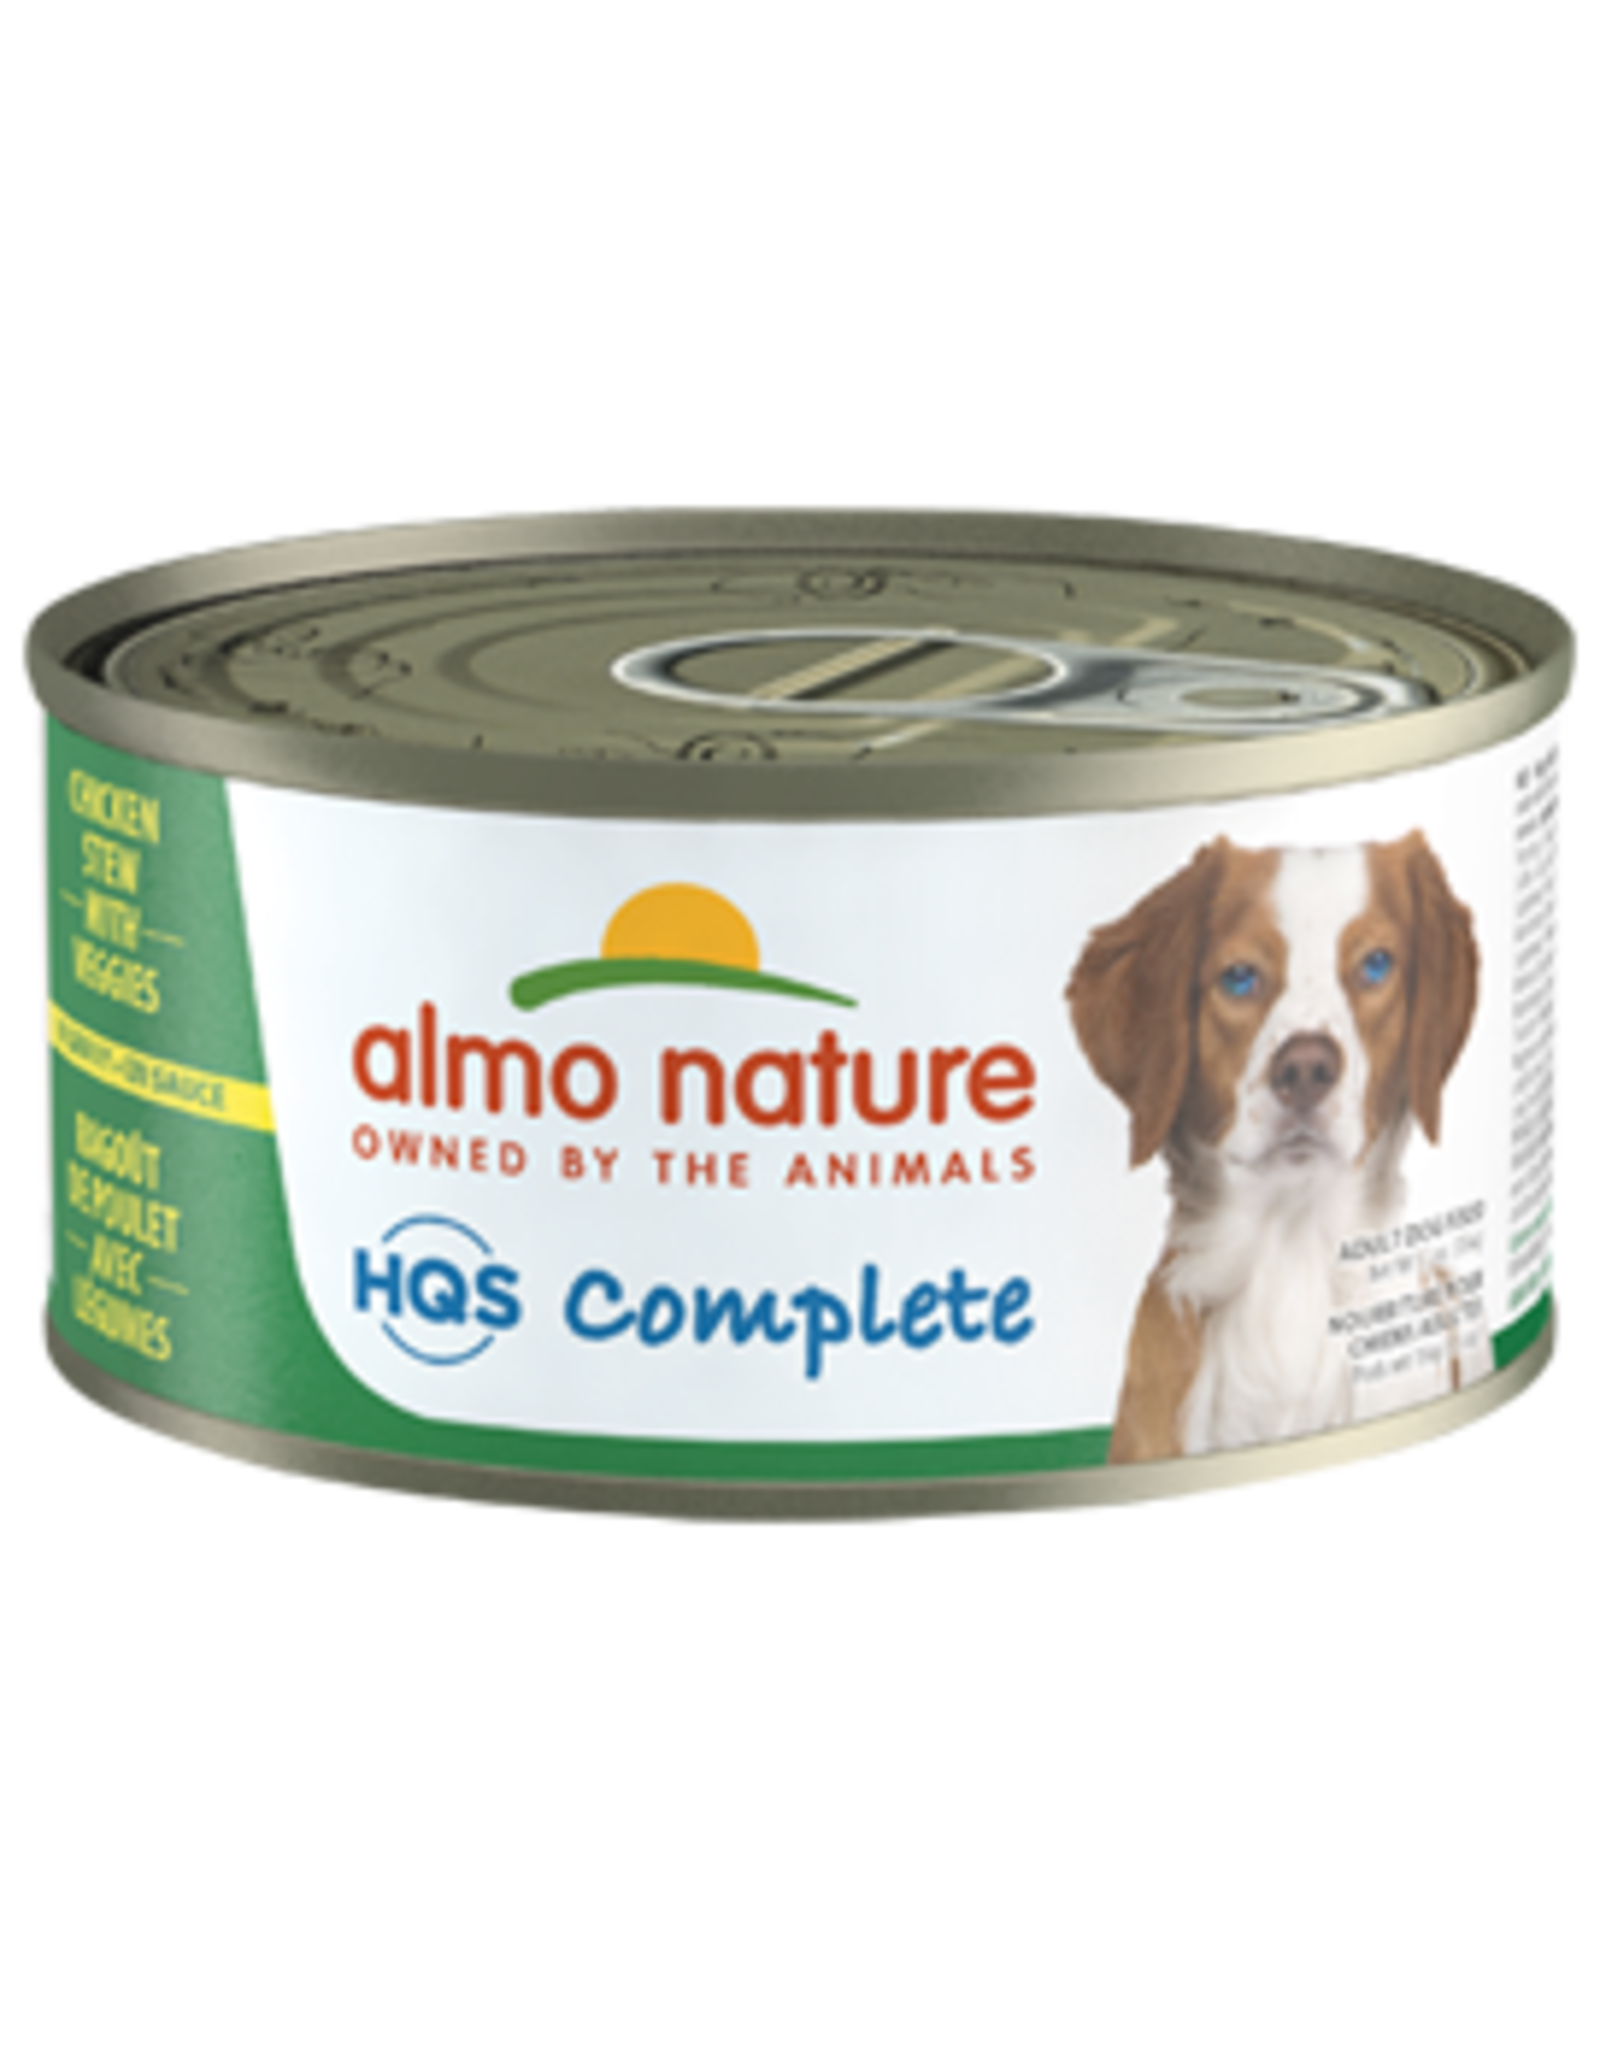 Almo Nature Almo Nature HQS Complete Chicken Stew w/Veggies Dog Food 5.5oz